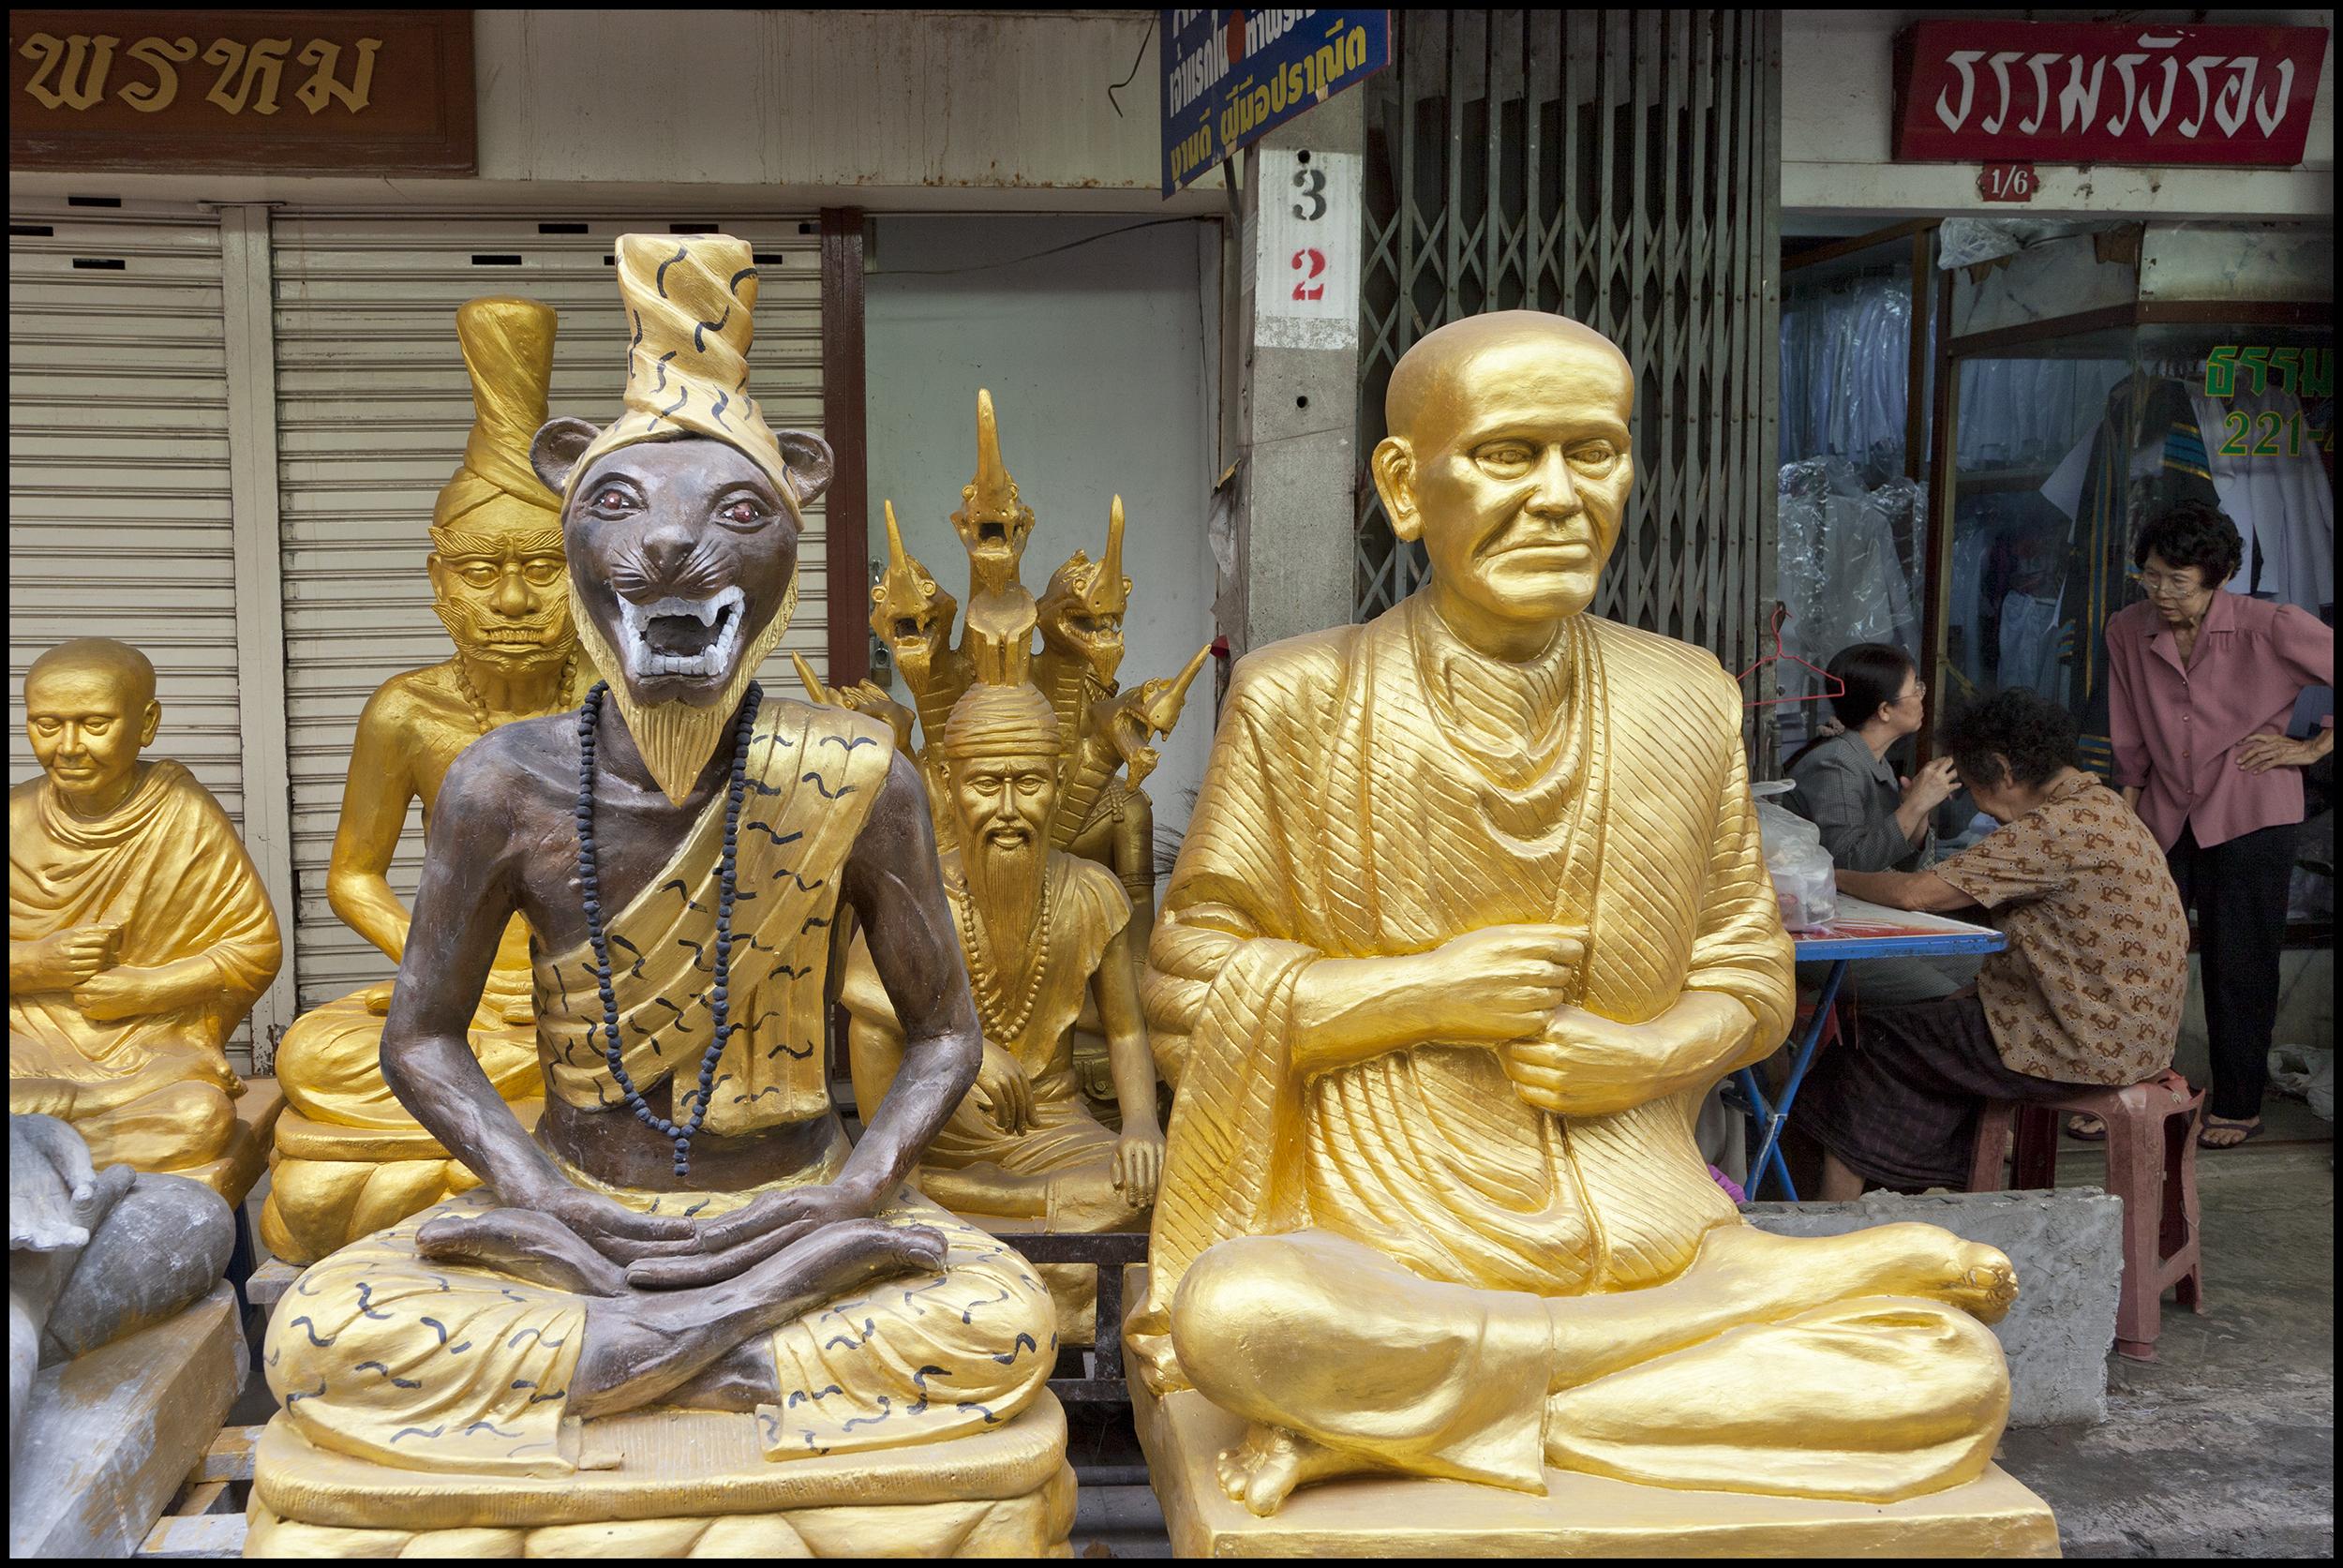 BANGKOK STATUES 5-3-11 15 INCH.jpg